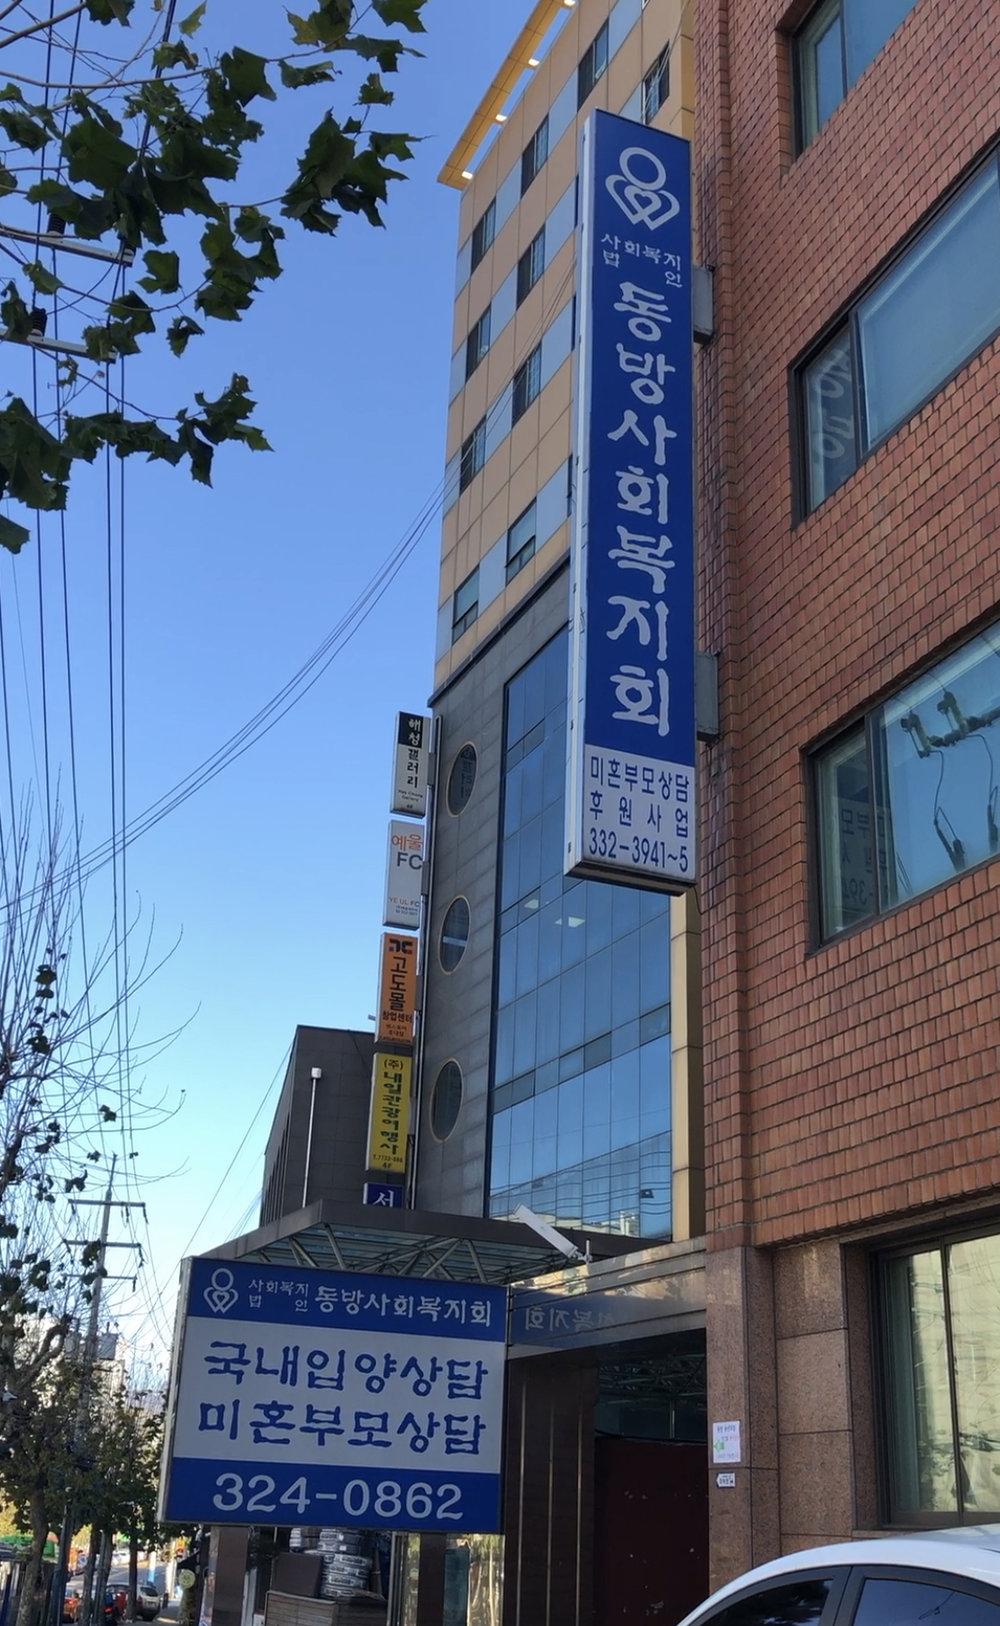 Eastern Social Welfare - my Korean adoption agency